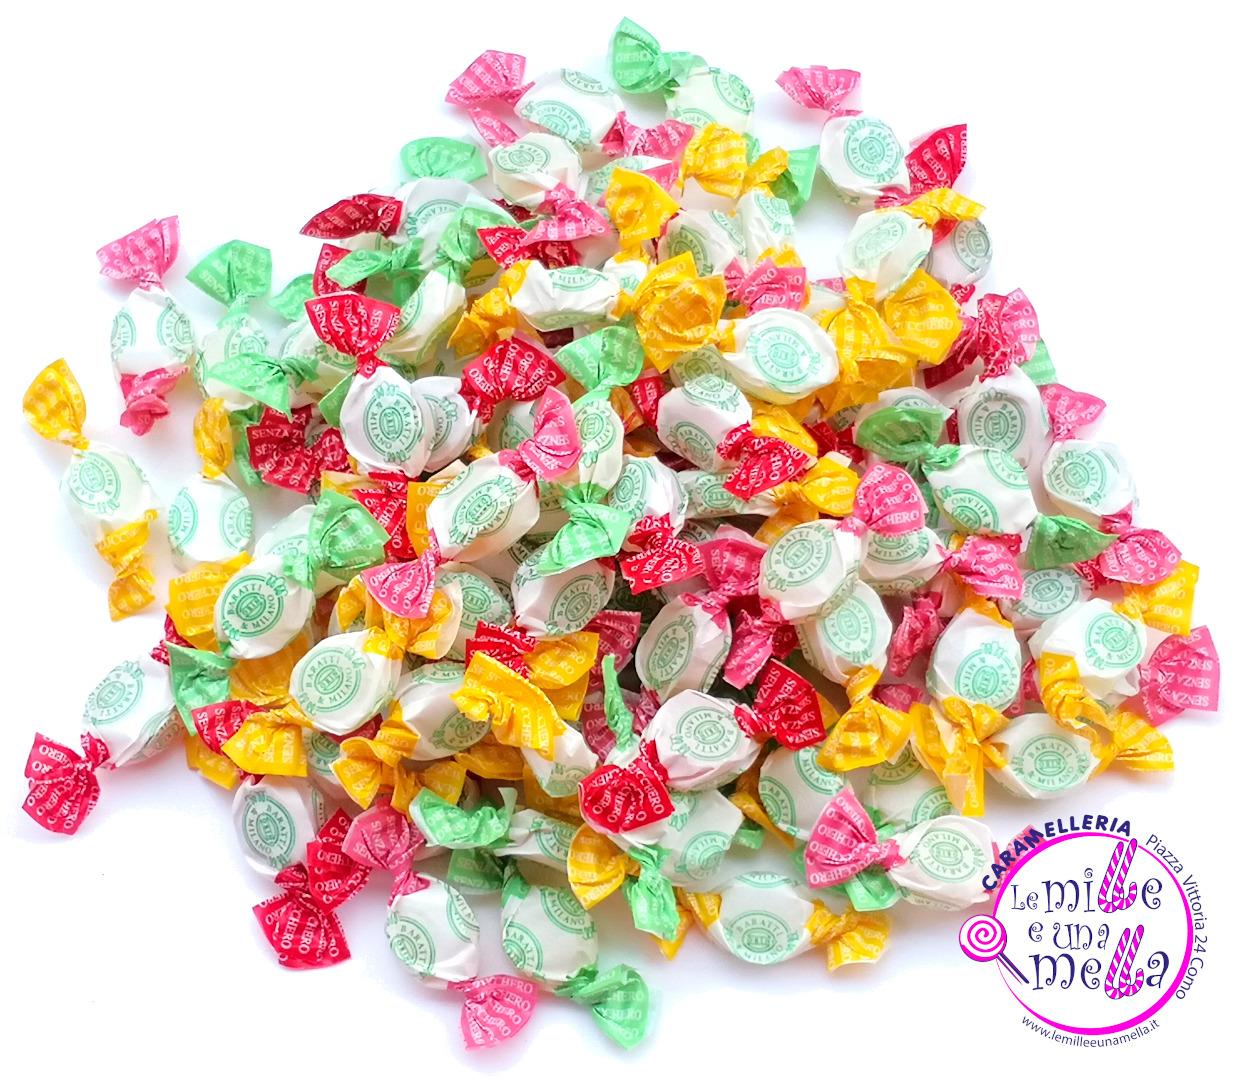 caramelle mini Baratti frutta senza zucchero vendita online